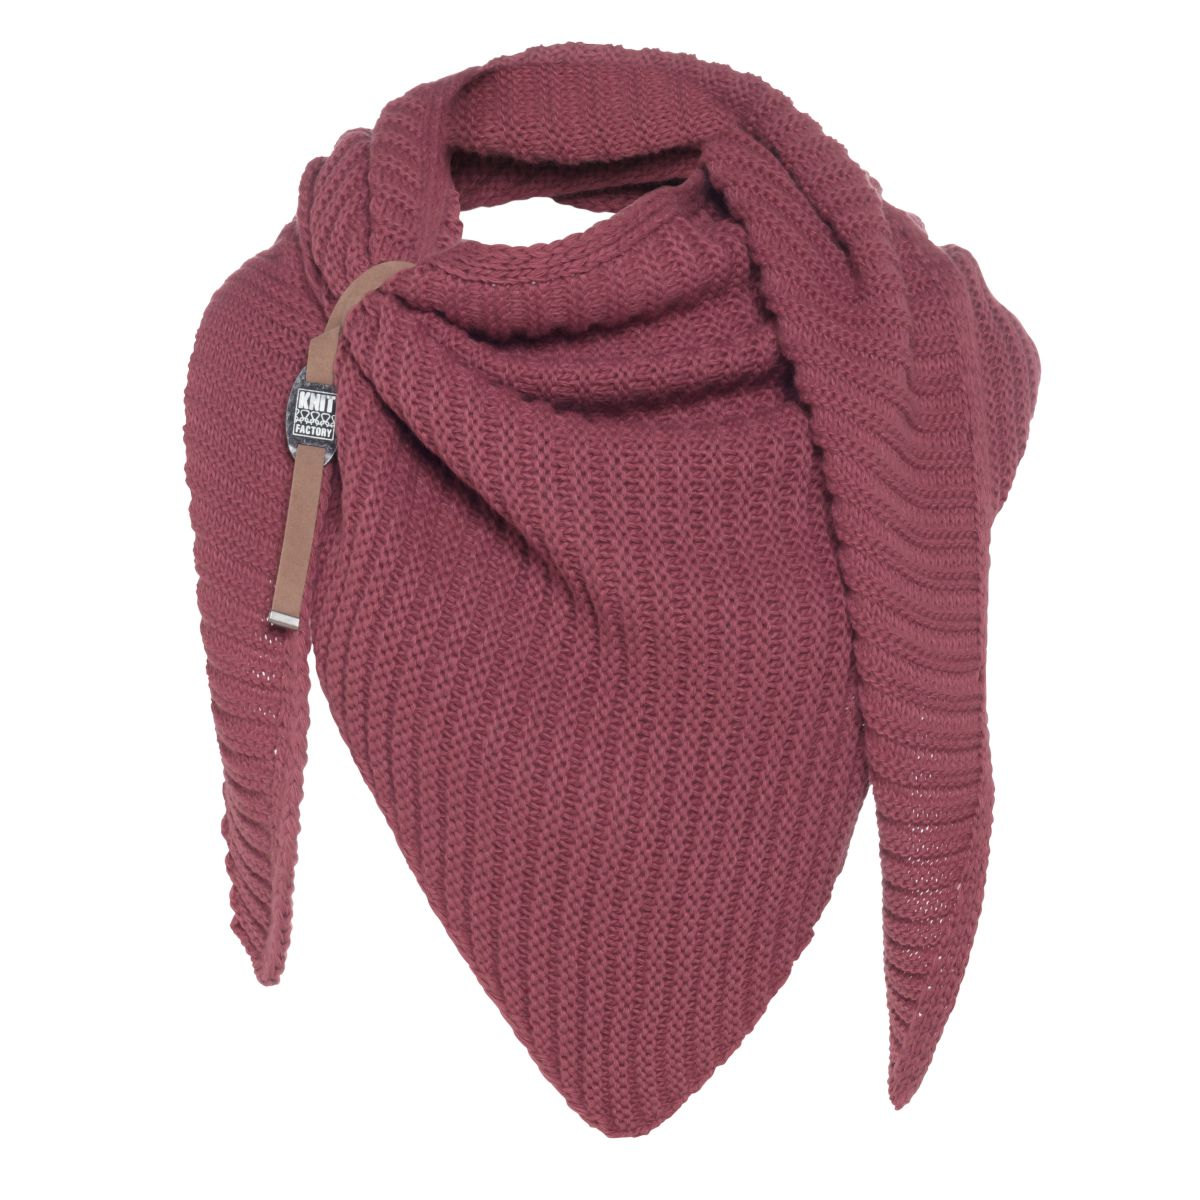 knit factory kf14706003850 demy omslagdoek stone red 1